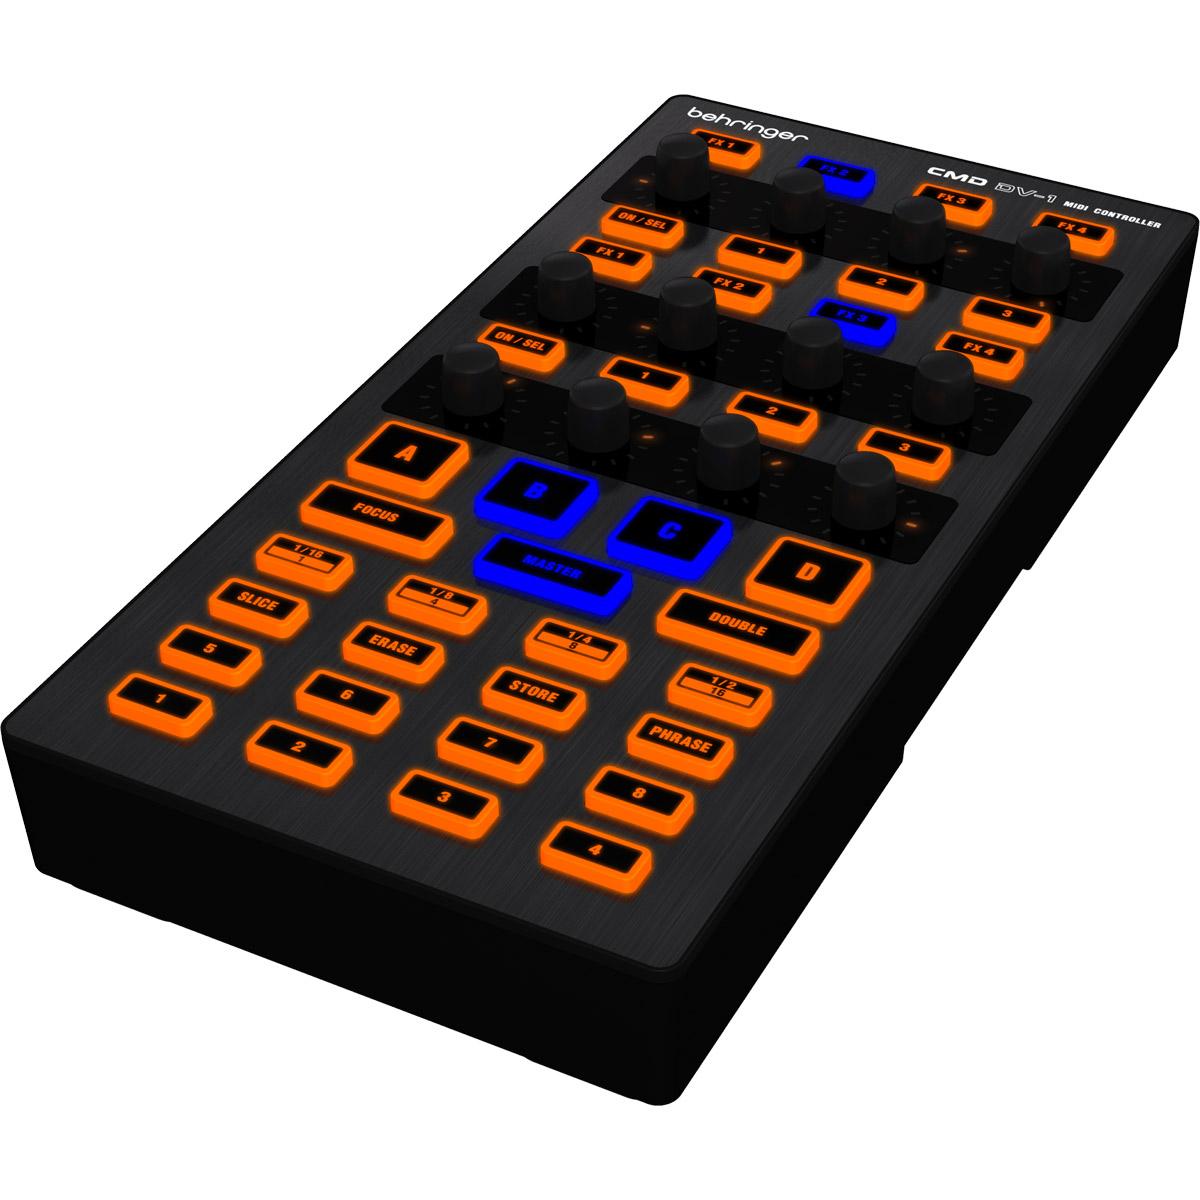 CMDDV1 - Controladora Midi USB DJ CMD DV 1 - Behringer